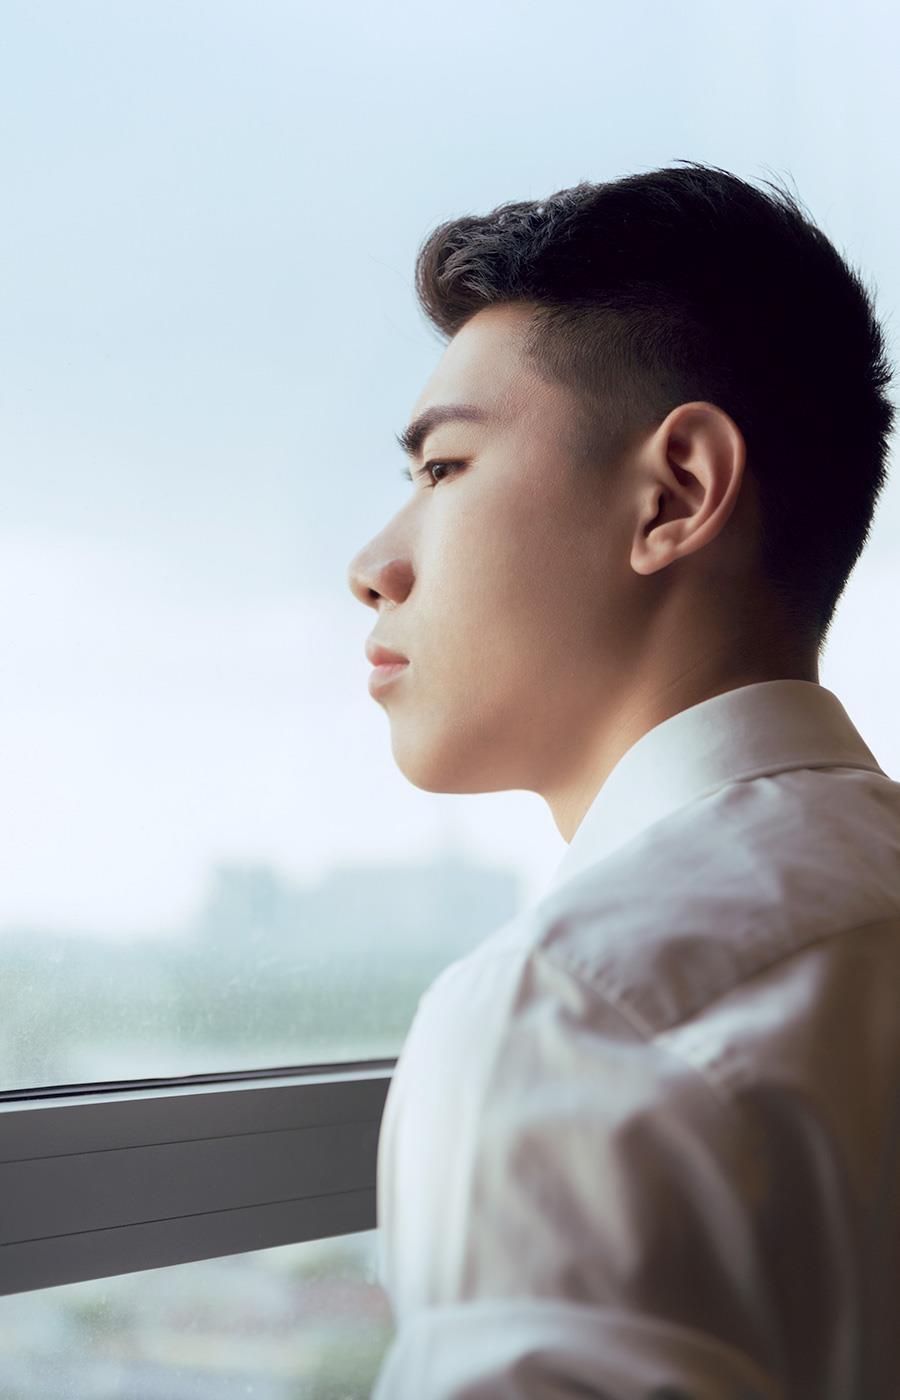 Producer 'Bac phan': 'Muon tao san pham chan dong nhu Despacito' hinh anh 3